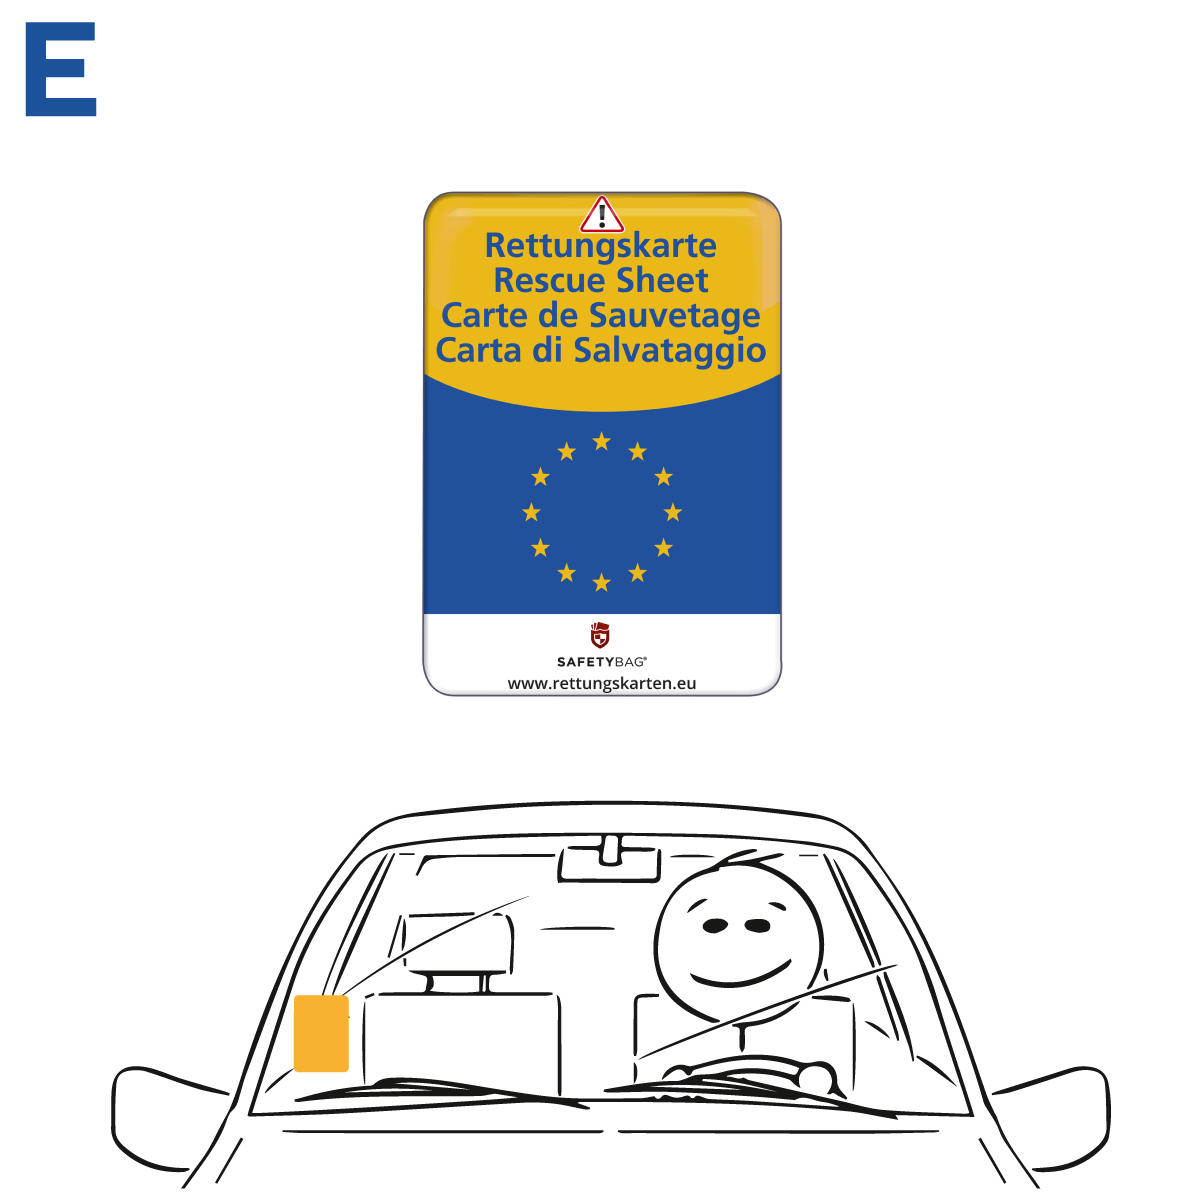 Safetybag Rettungskarten Halterung Rettungsdatenblatt –Variante E Europa – Position an der Frontscheibe Windschutzscheibe